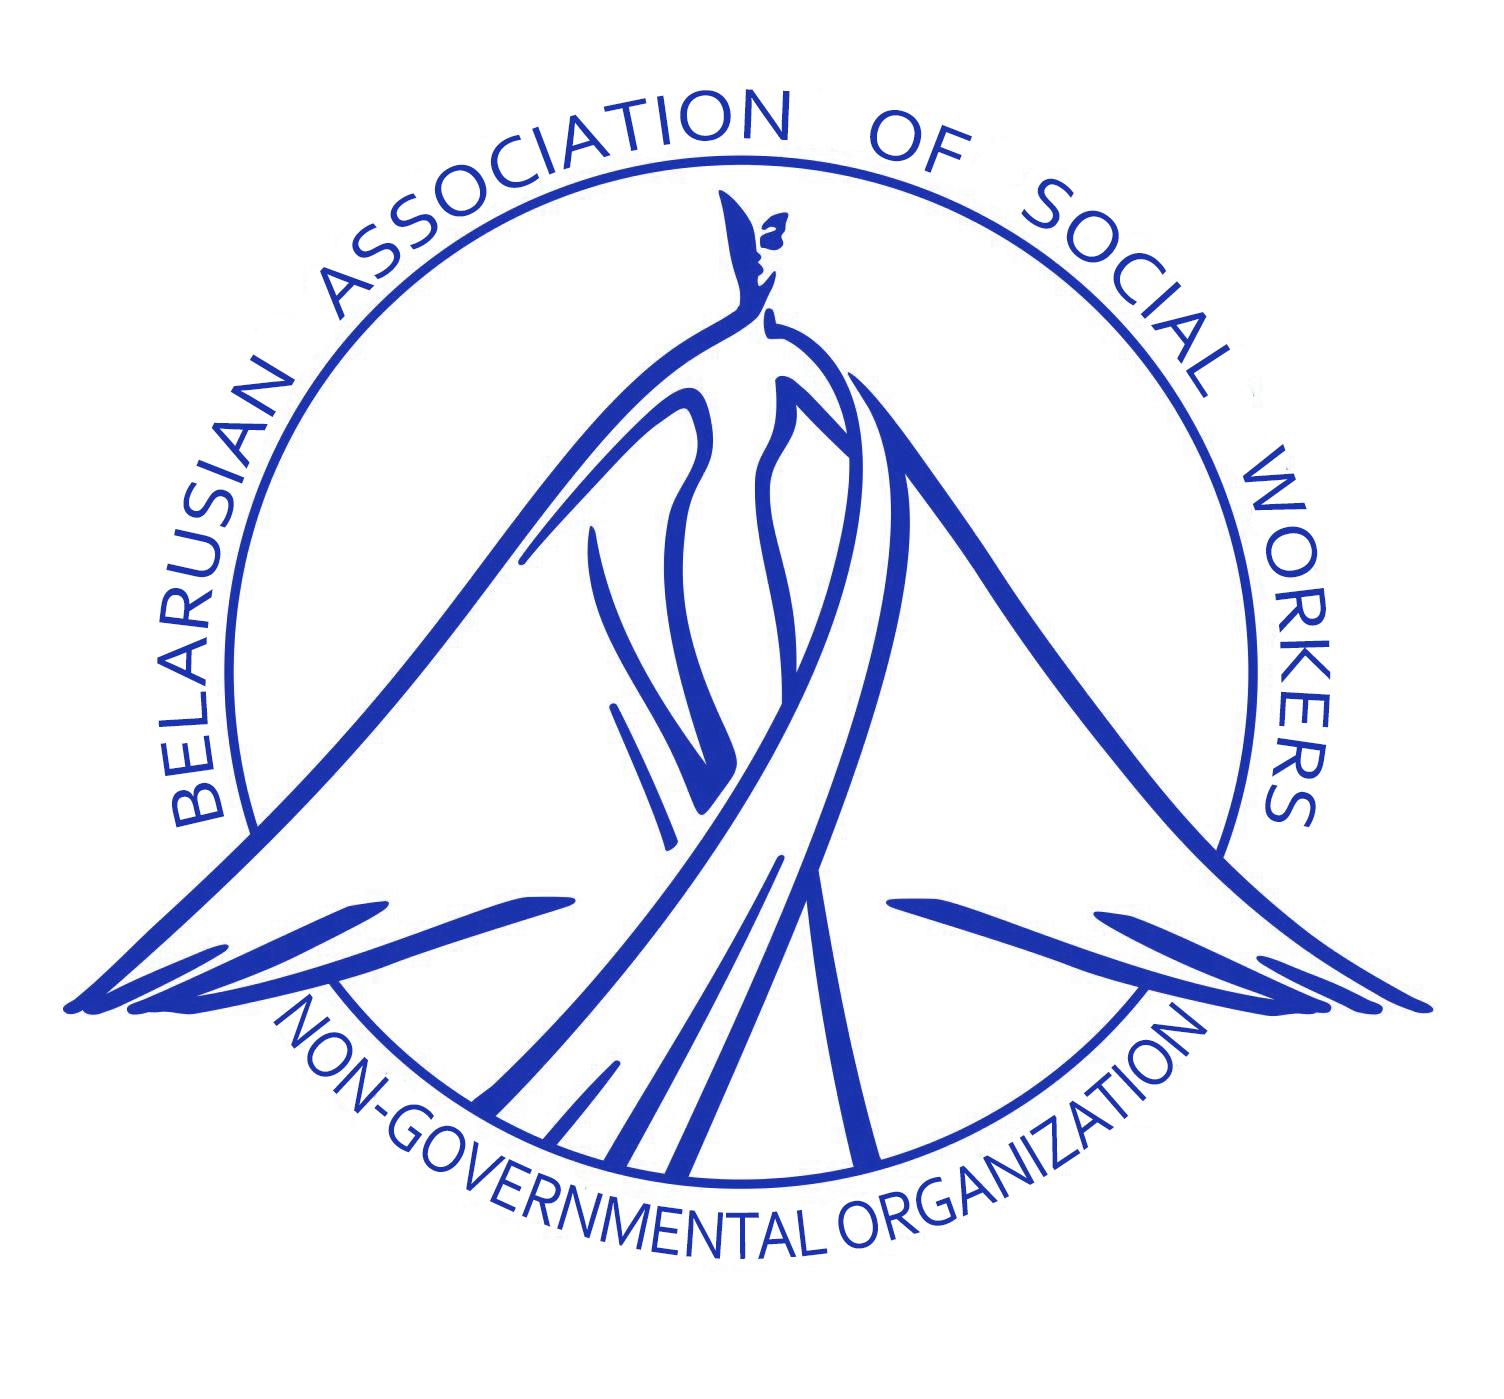 Belarusian association of social workers